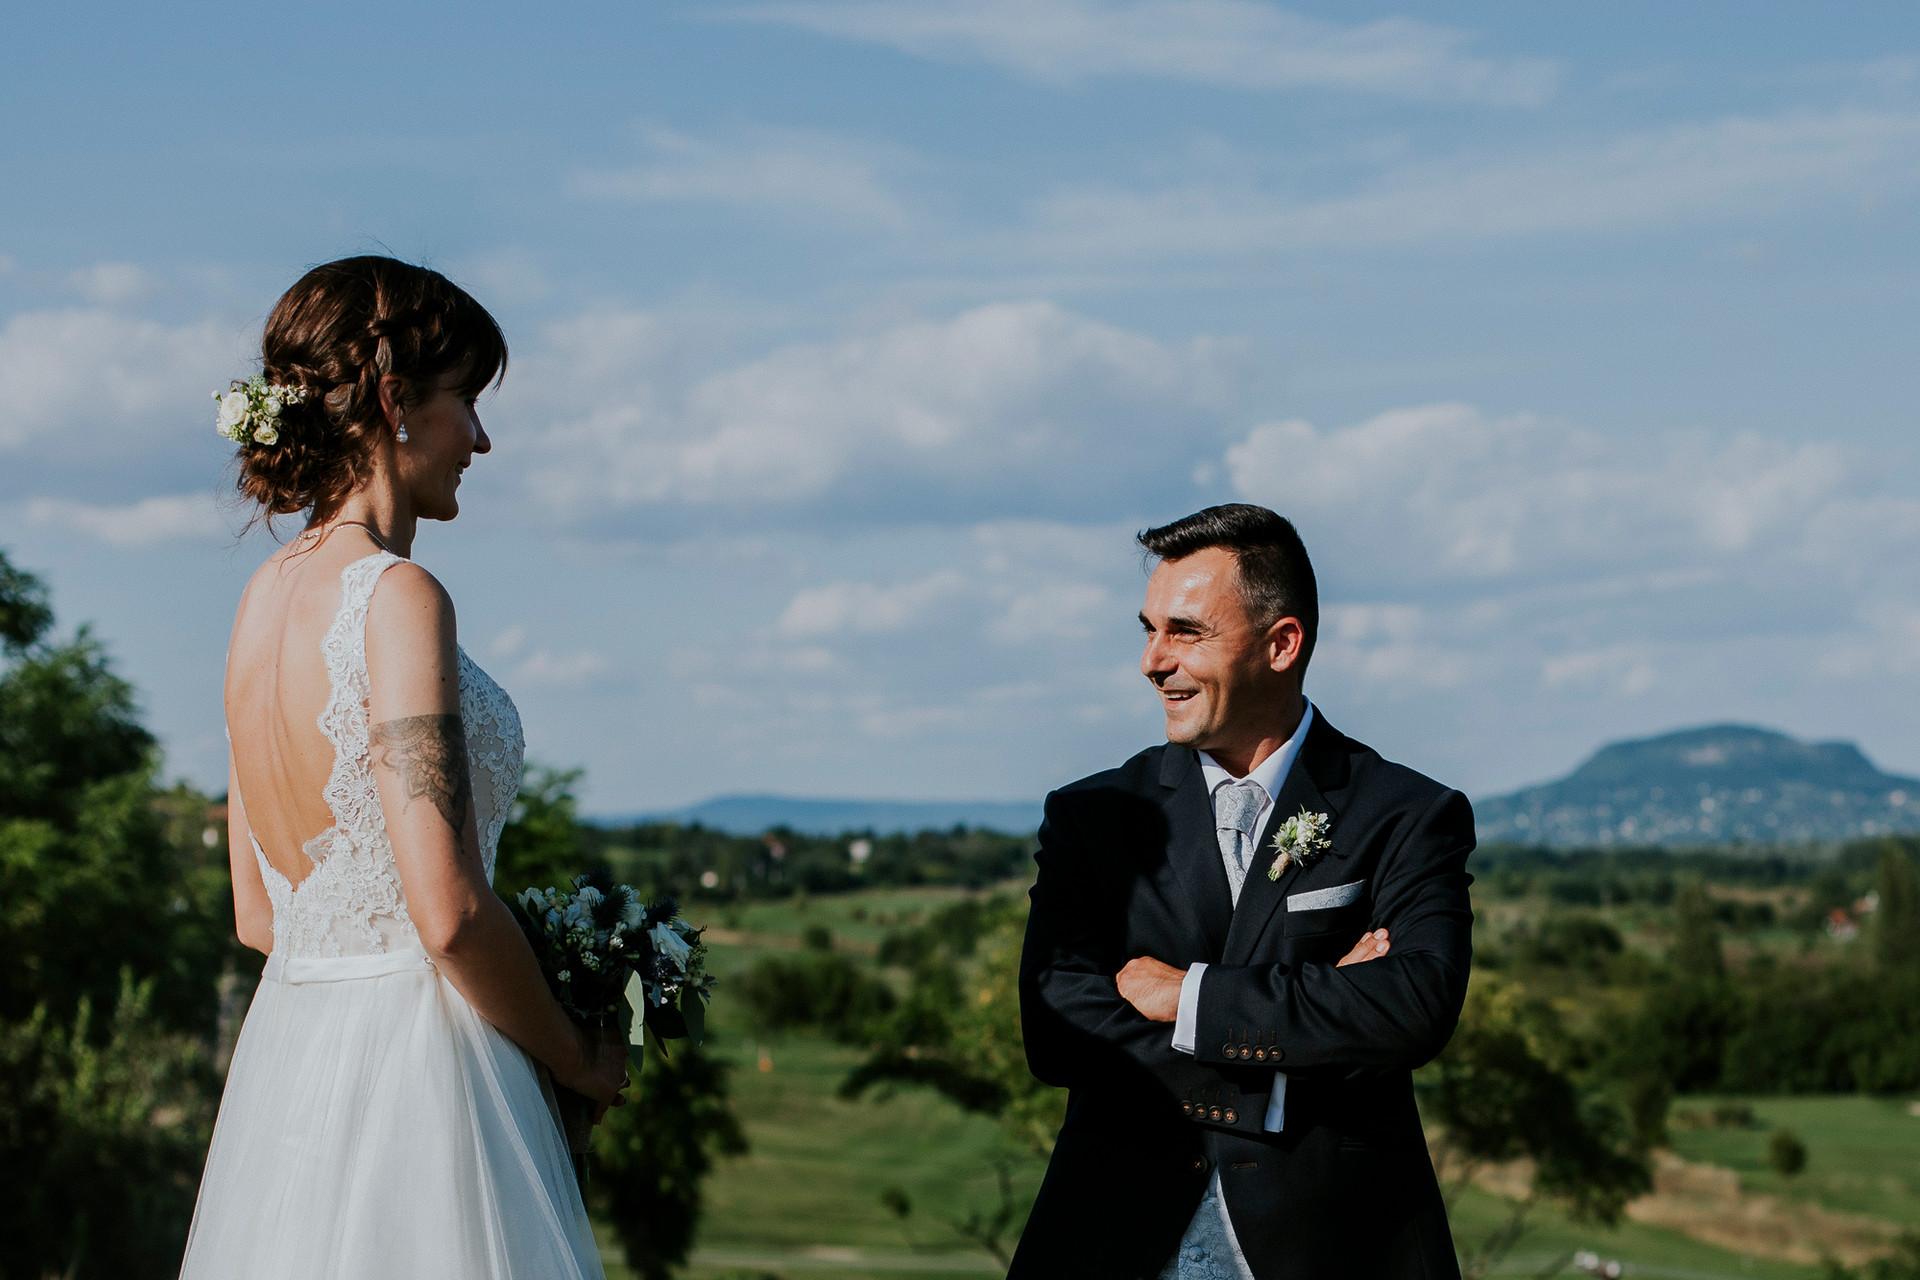 Hungary wedding 3.JPG